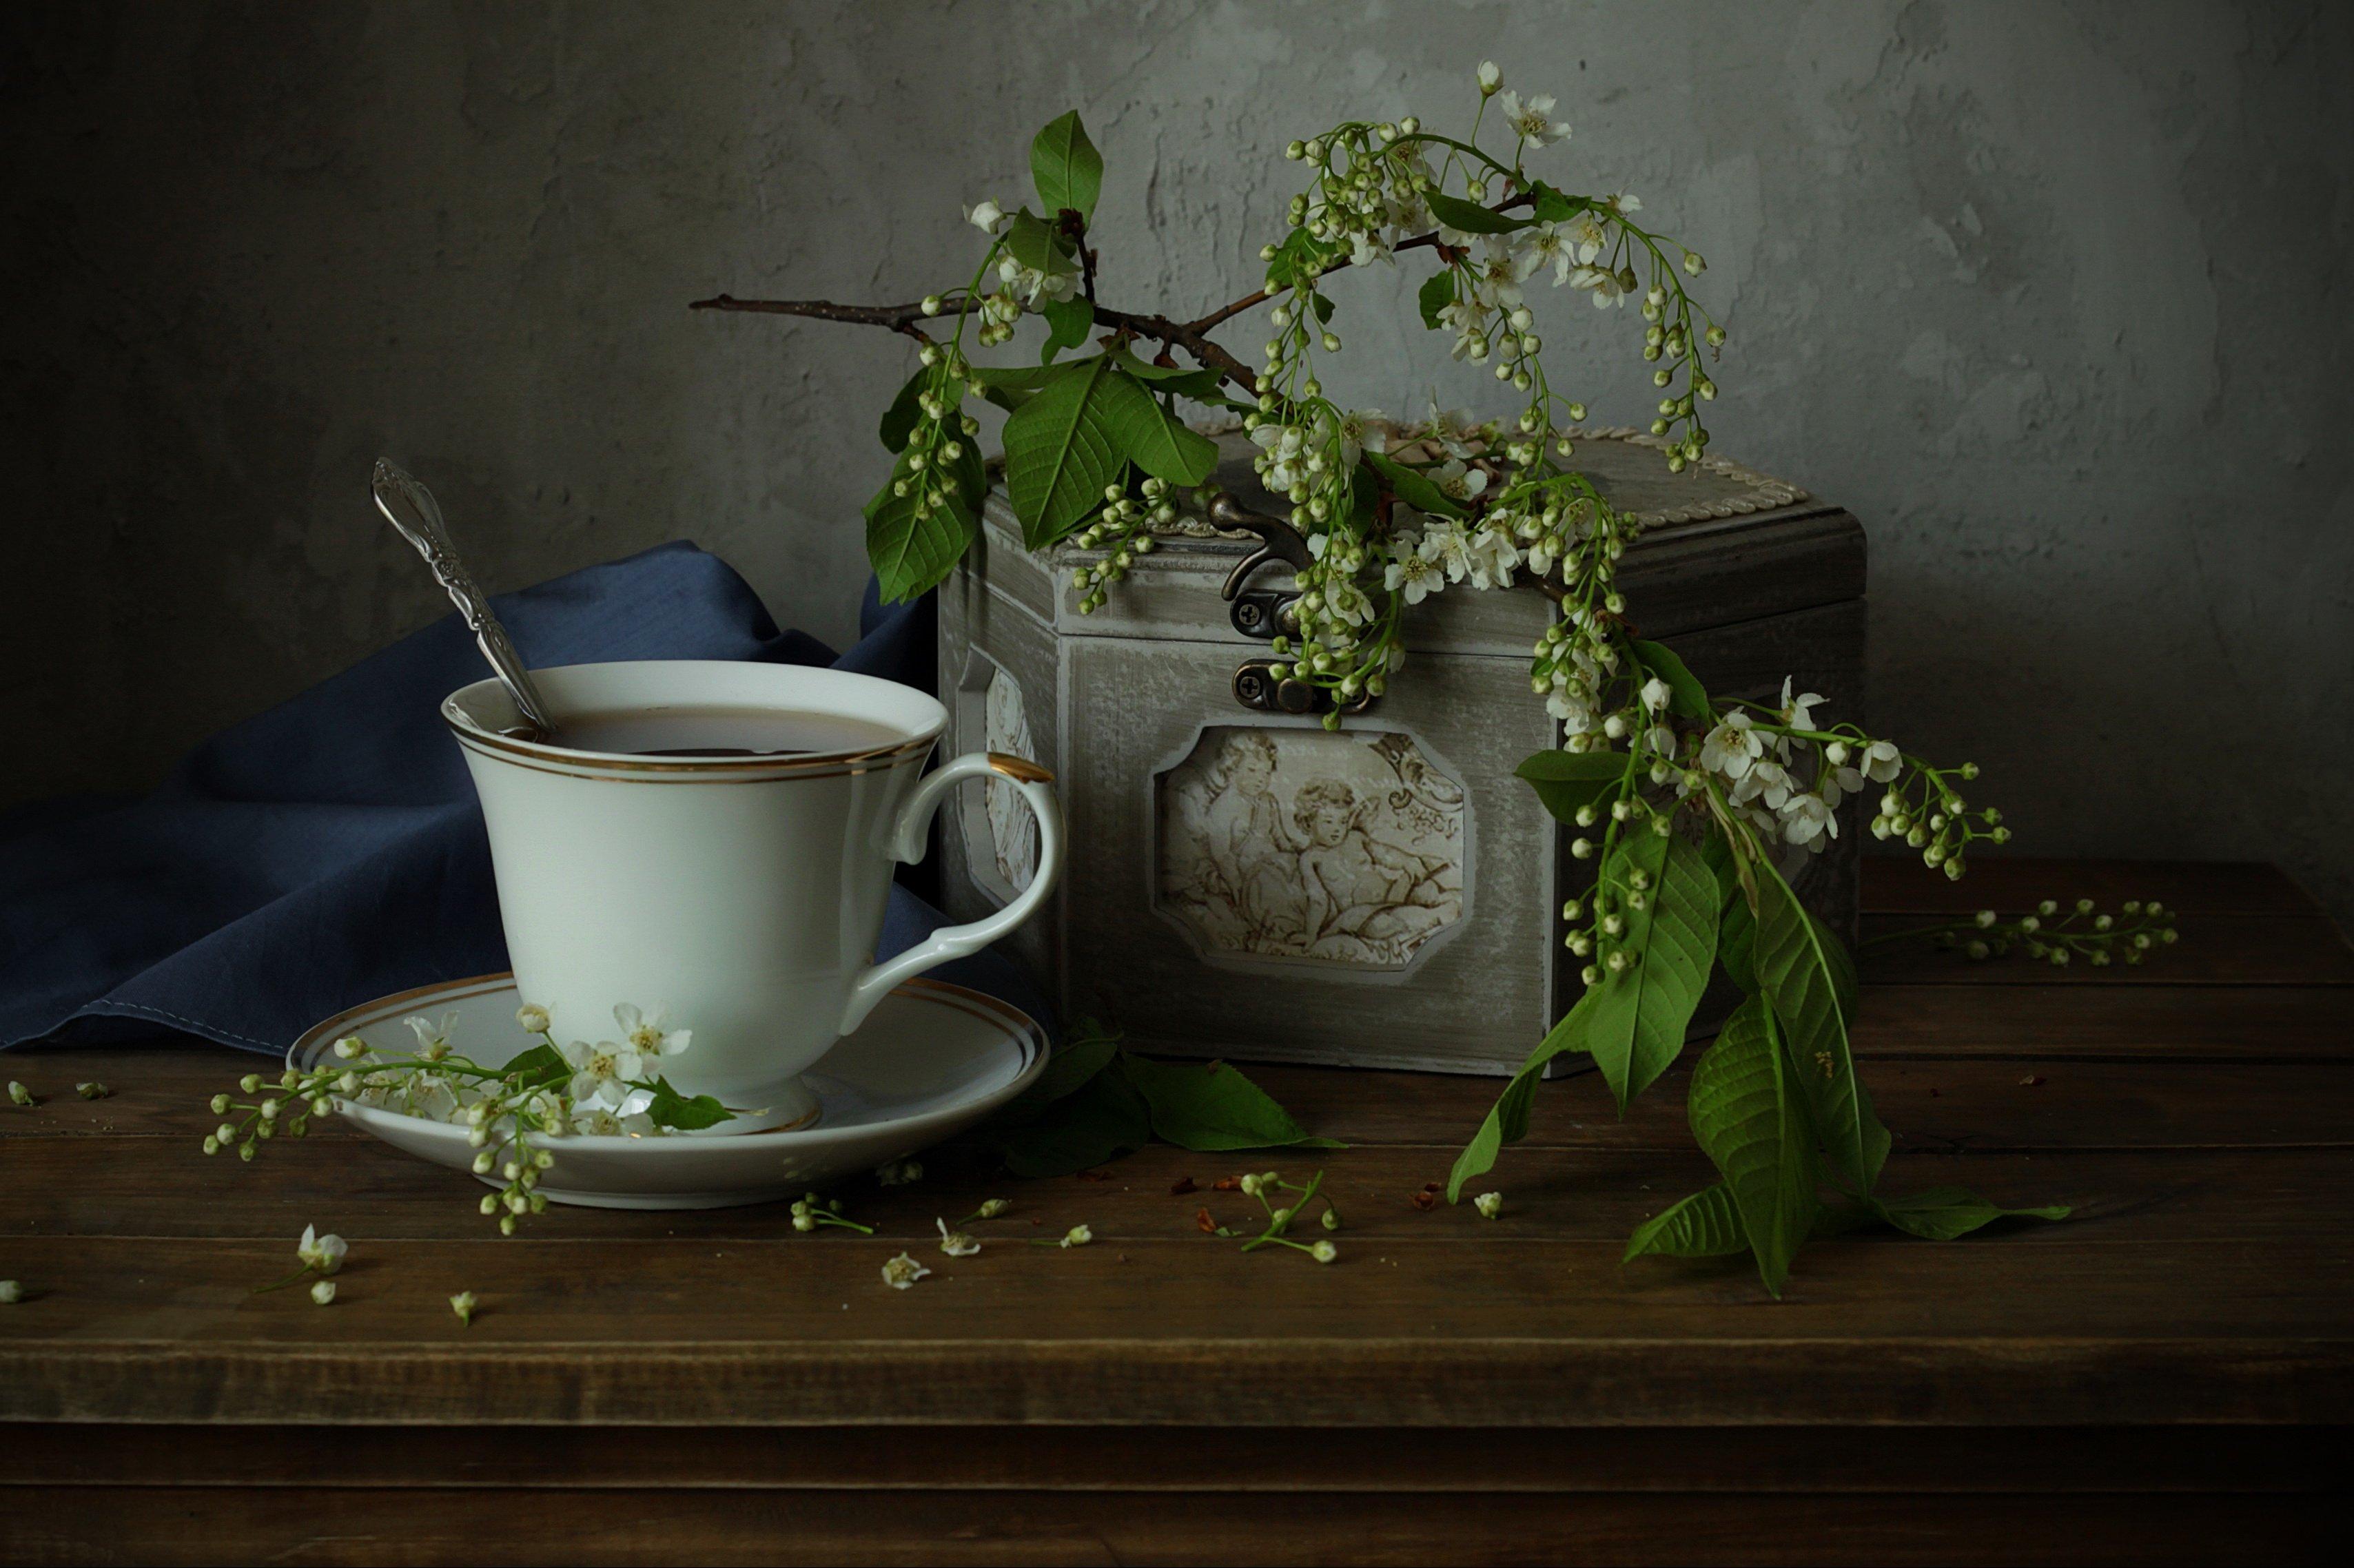 натюрморт, черемуха, чашка, шкатулка, весна, Рябикова-Багузова Галина